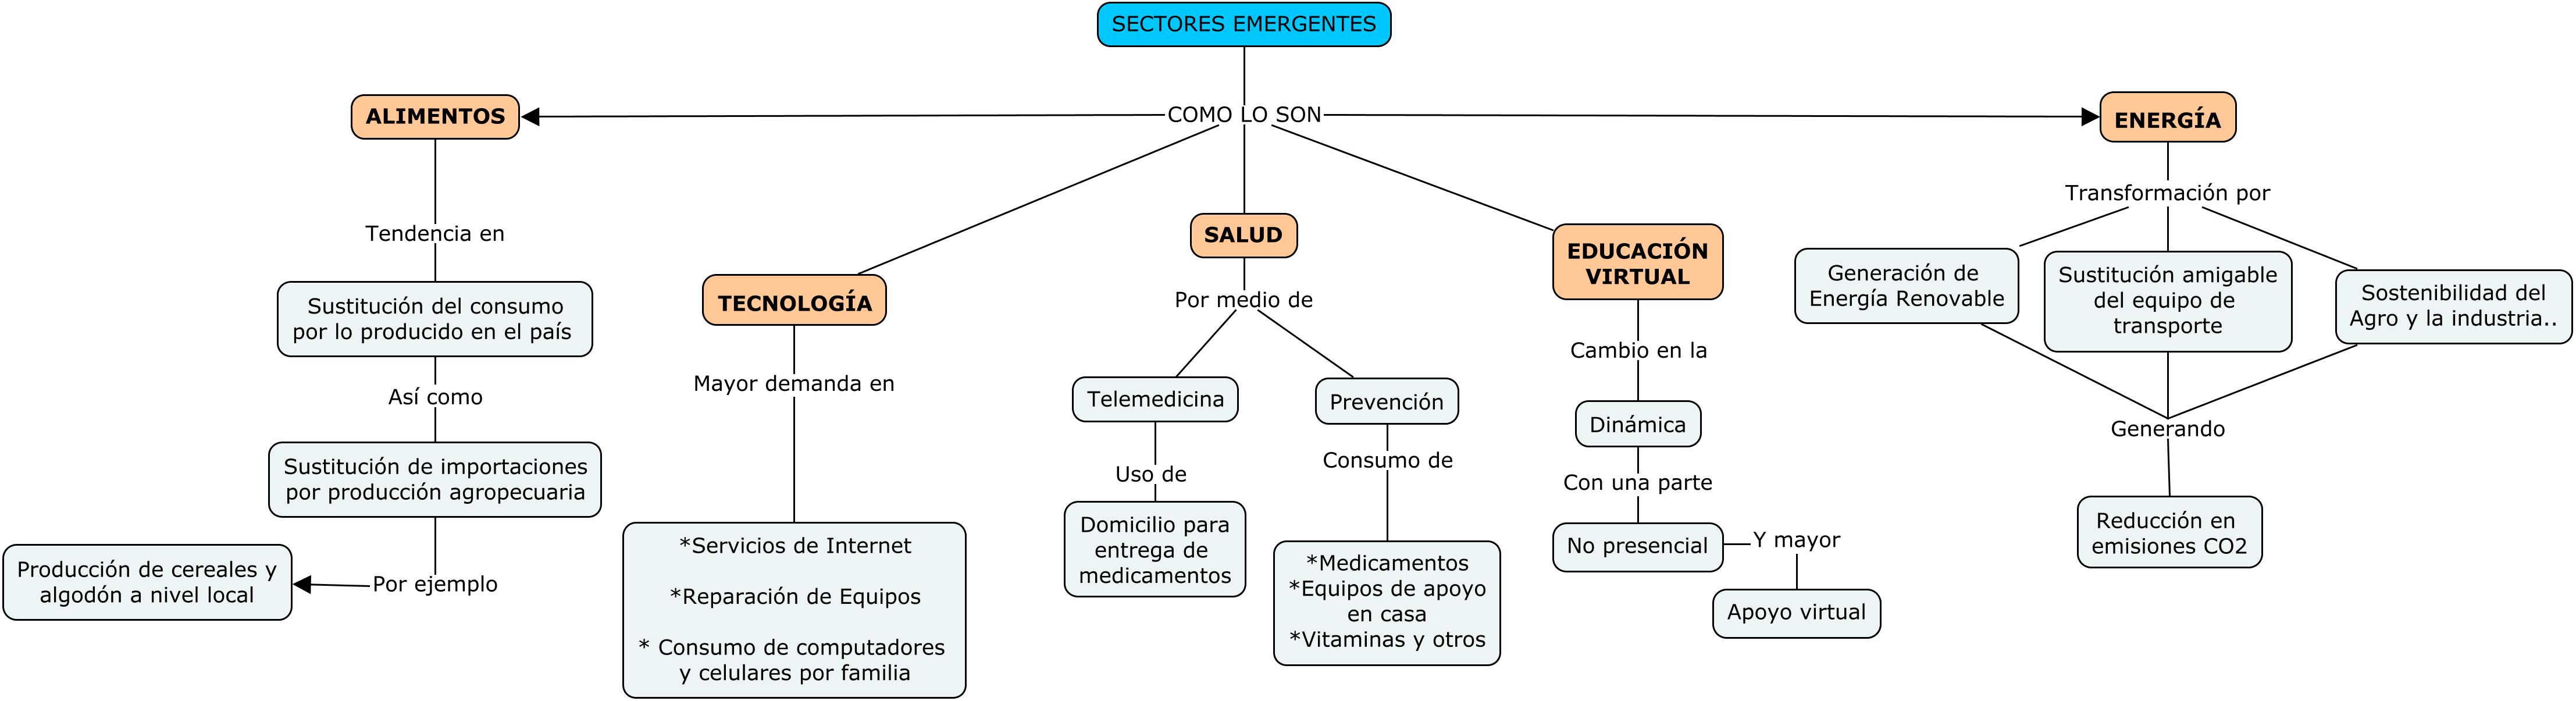 Sectores emergentes prospectiva y perspectiva